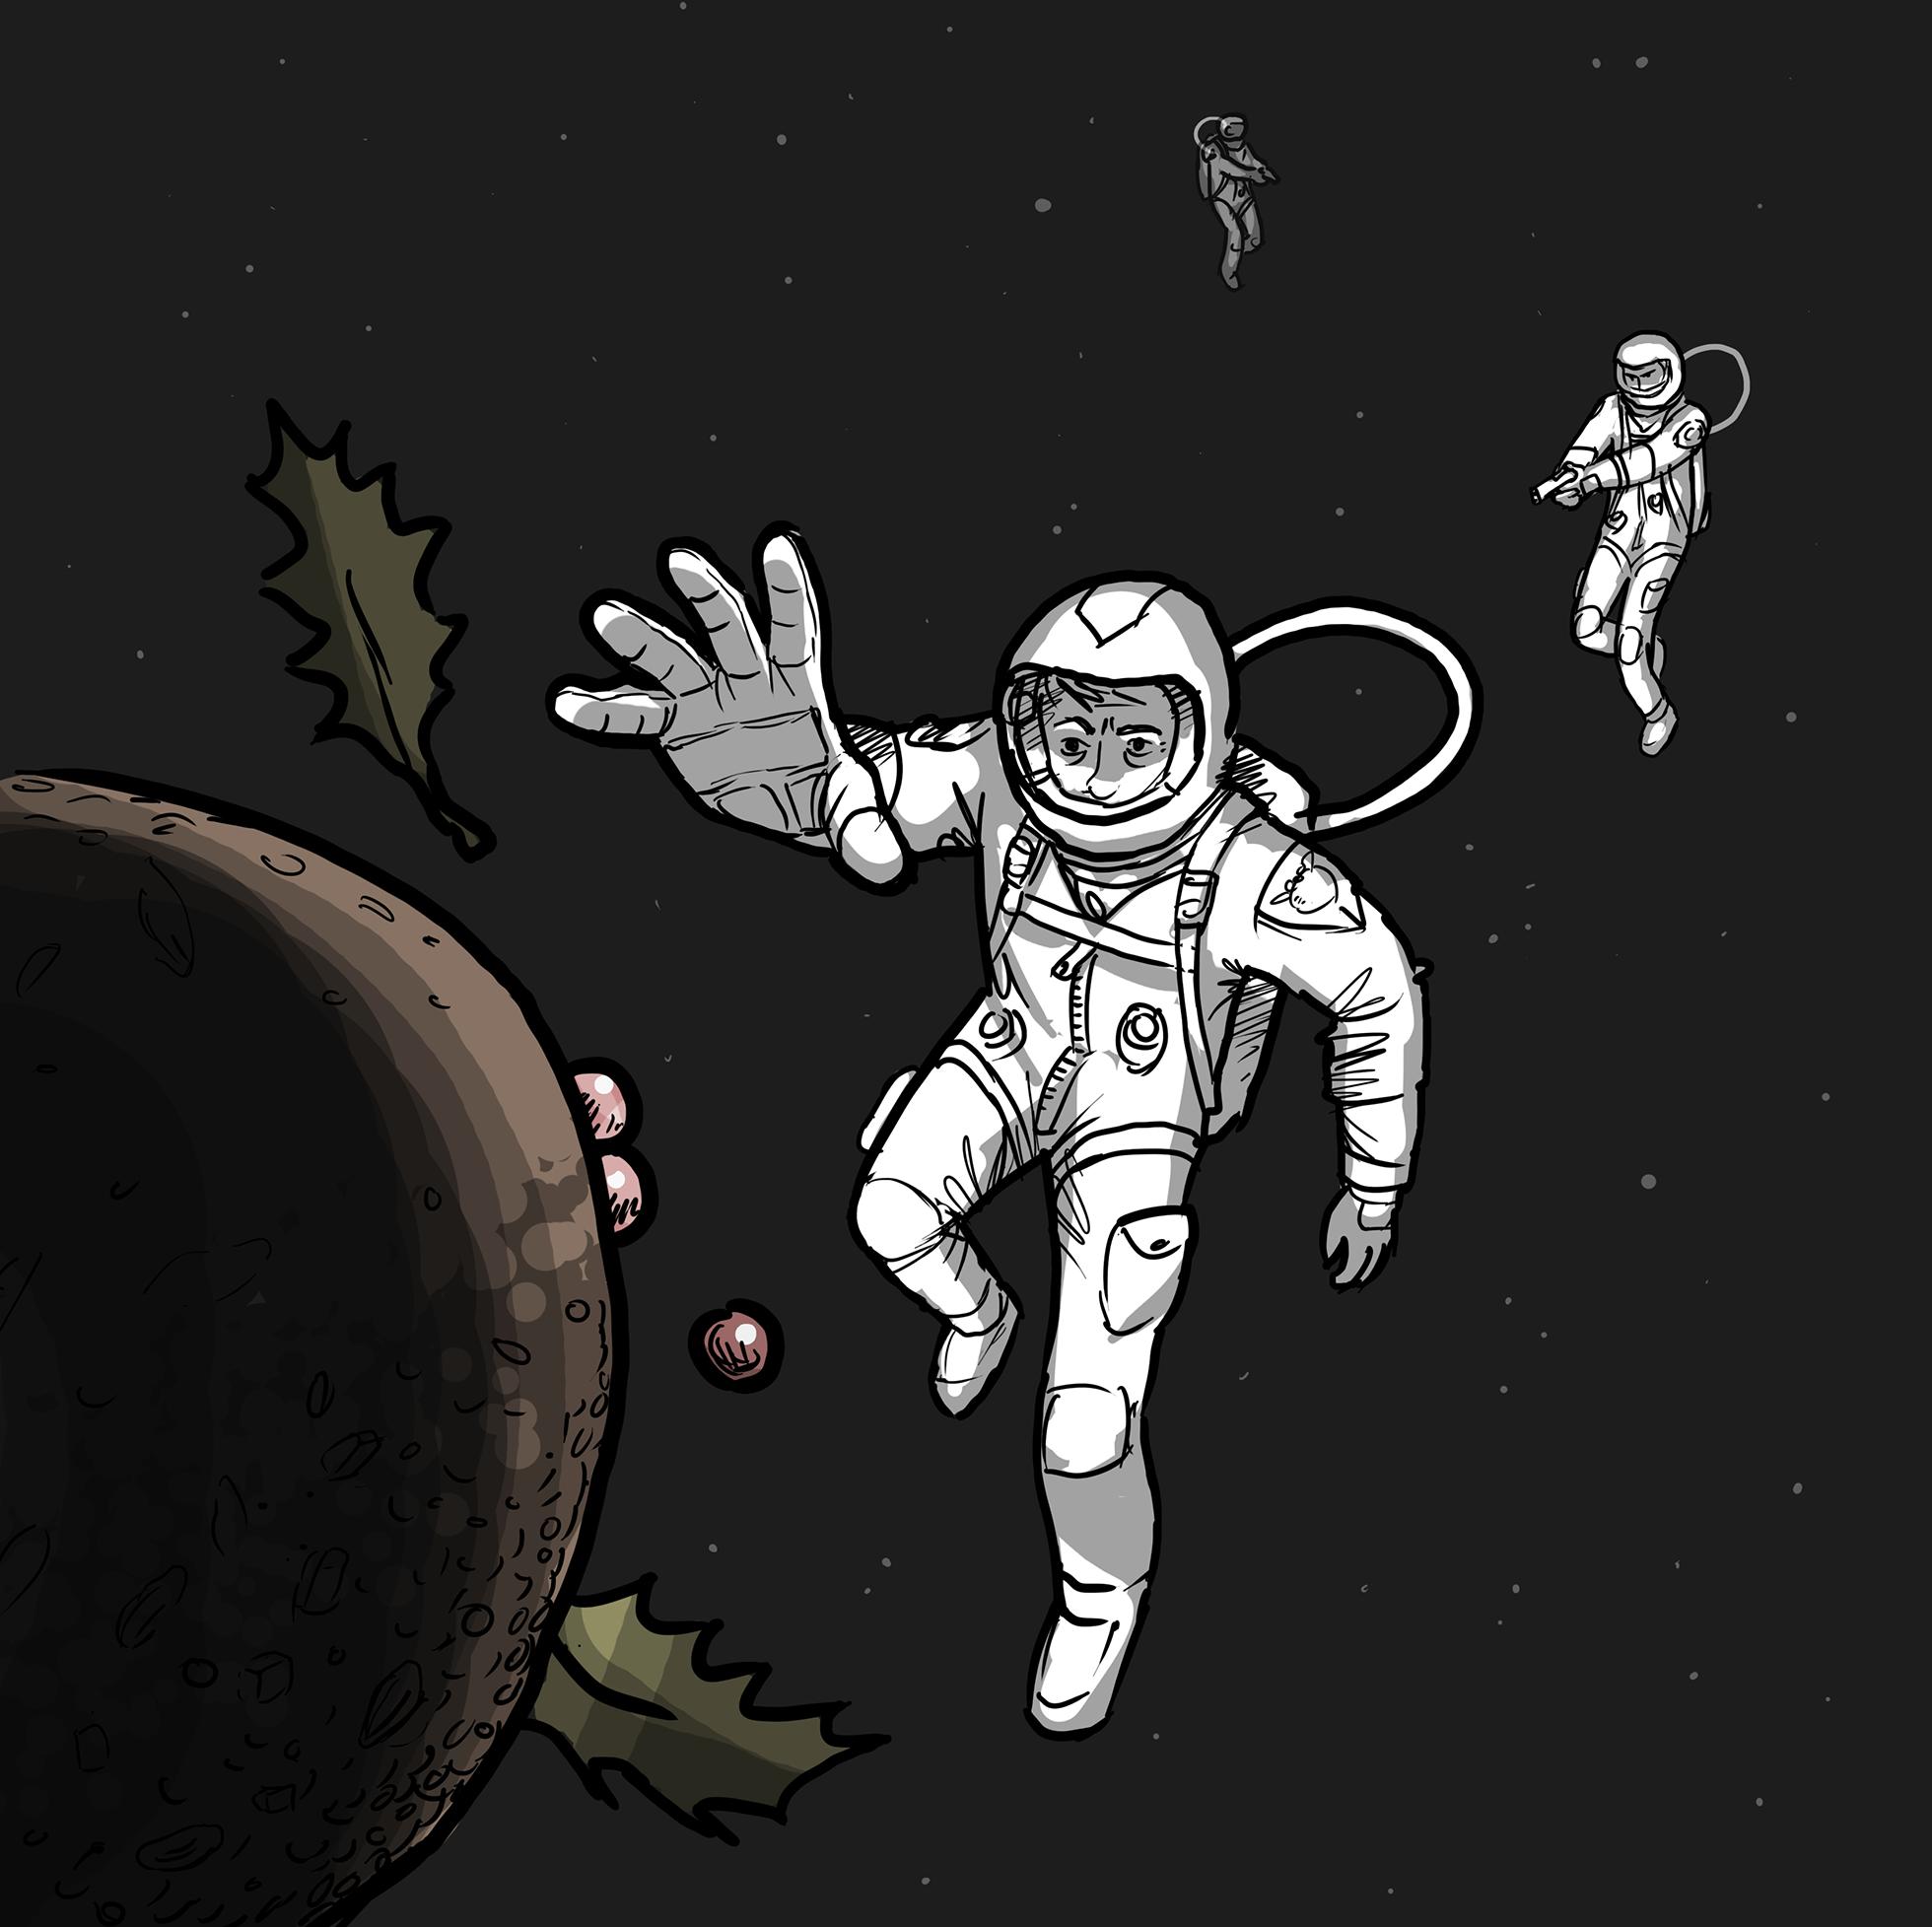 Astronaut reaching